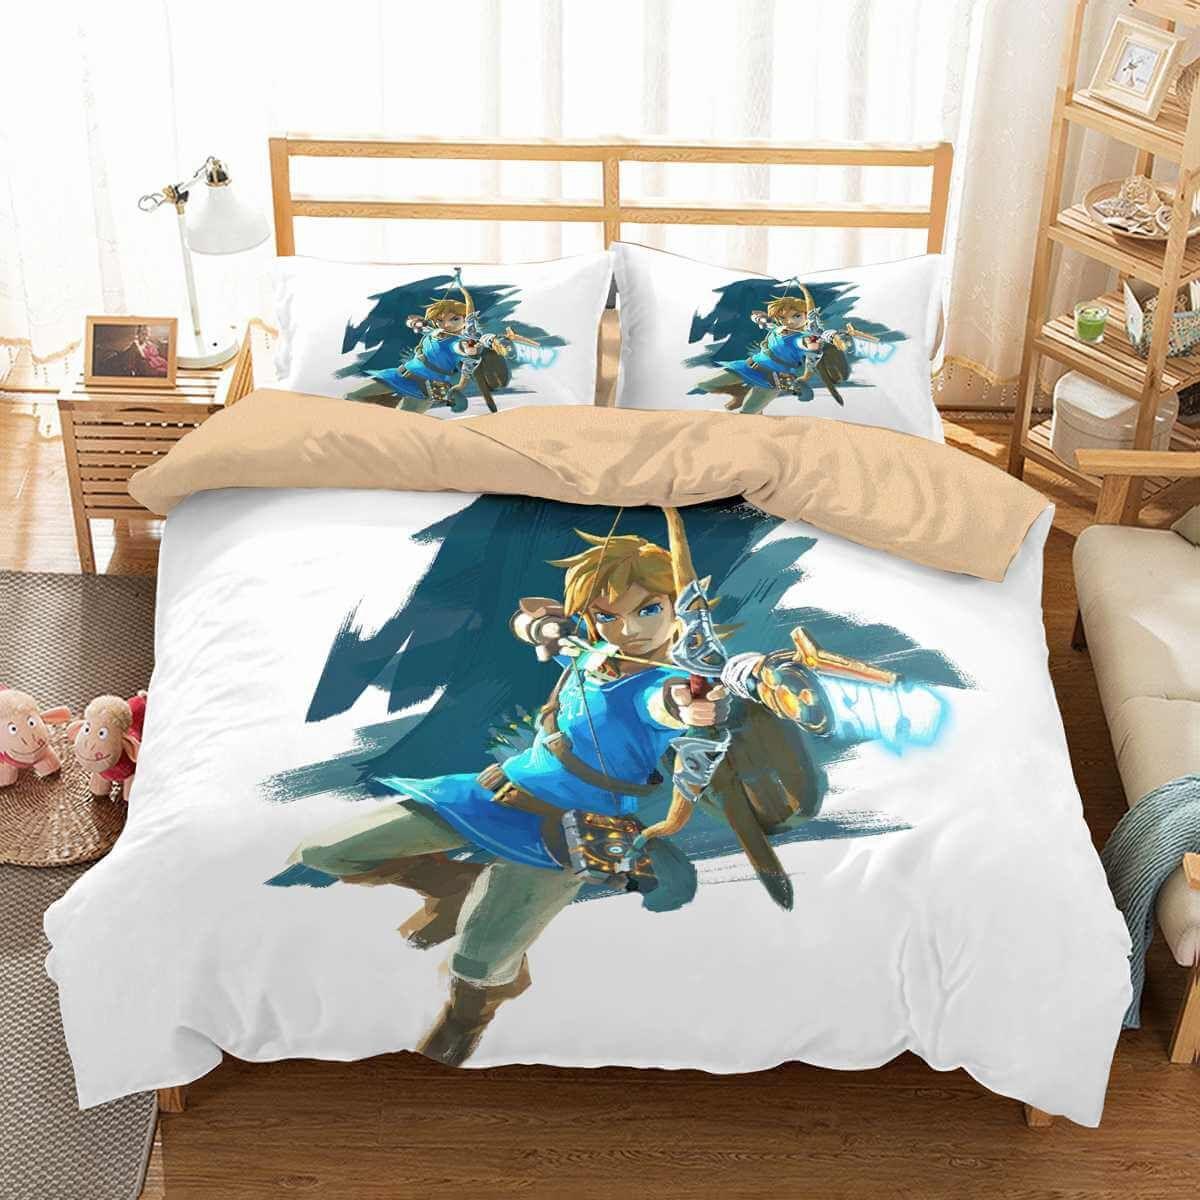 3d Customize The Legend Of Zelda Bedding Set Duvet Cover Set Bedroom Set Bedlinen Duvet Cover Sets Bedroom Set Bedding Sets